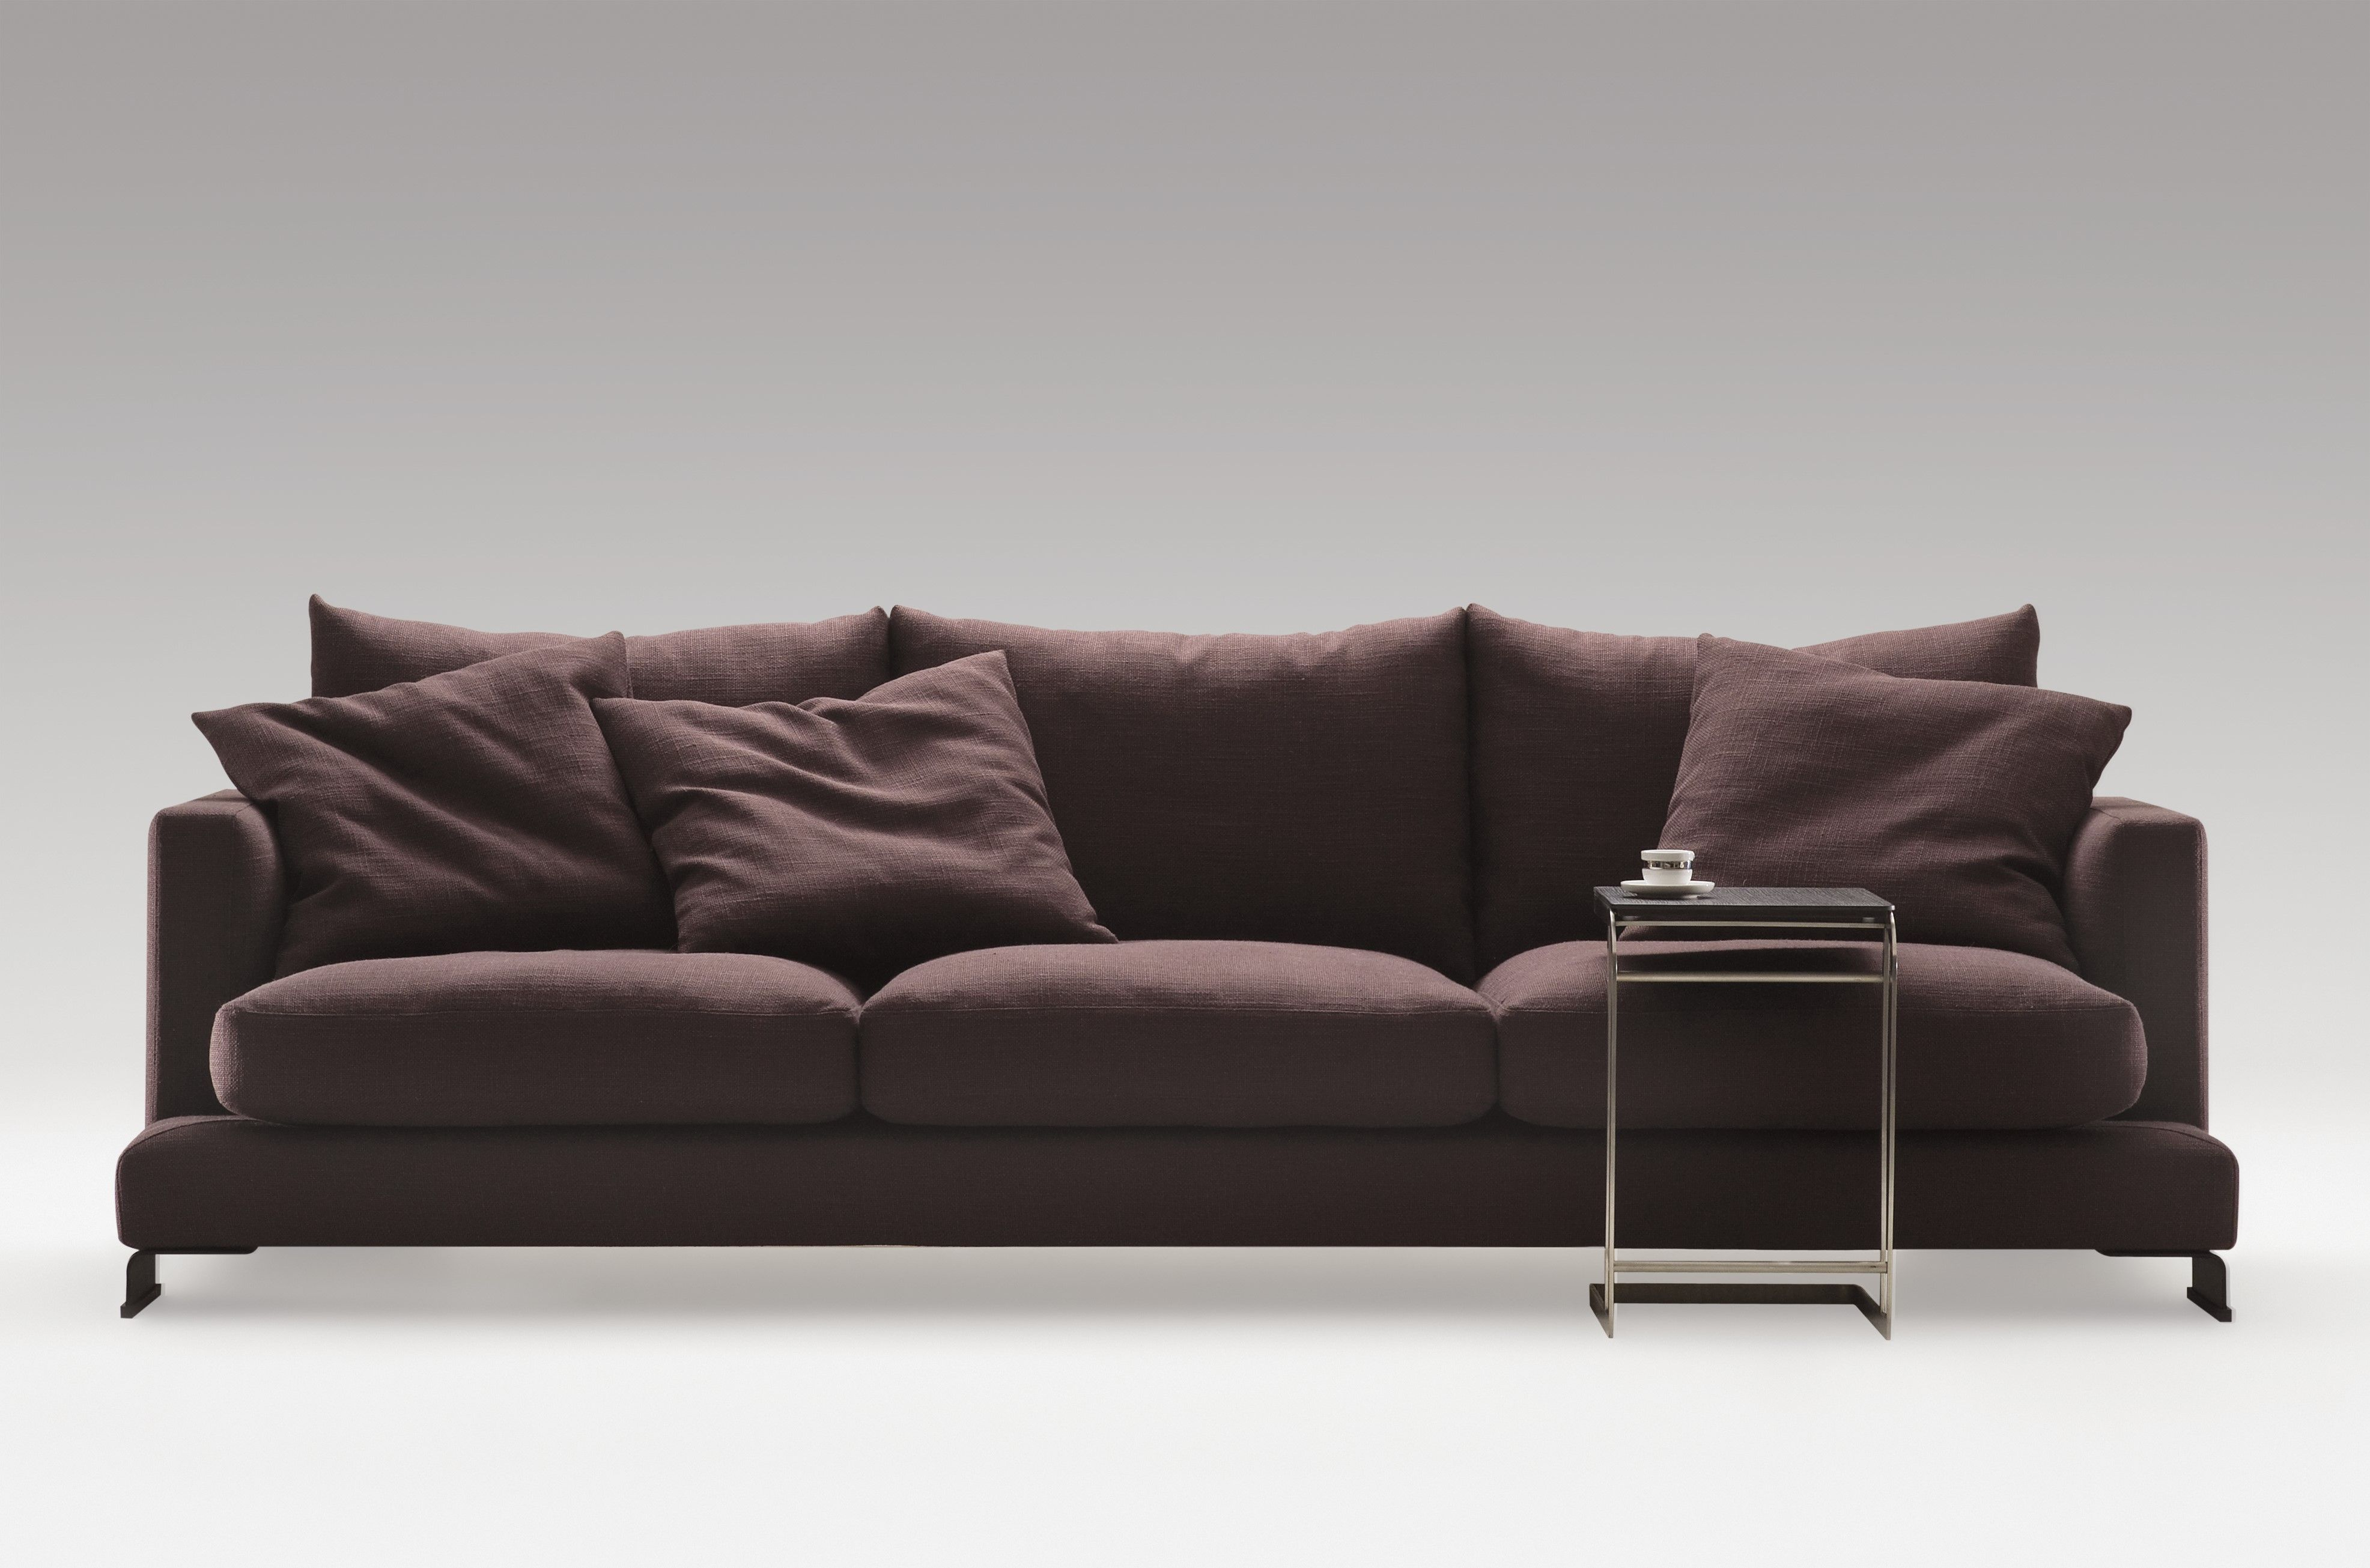 Lazytime Sofa Sofa Camerich Sofa Lazy Sofa